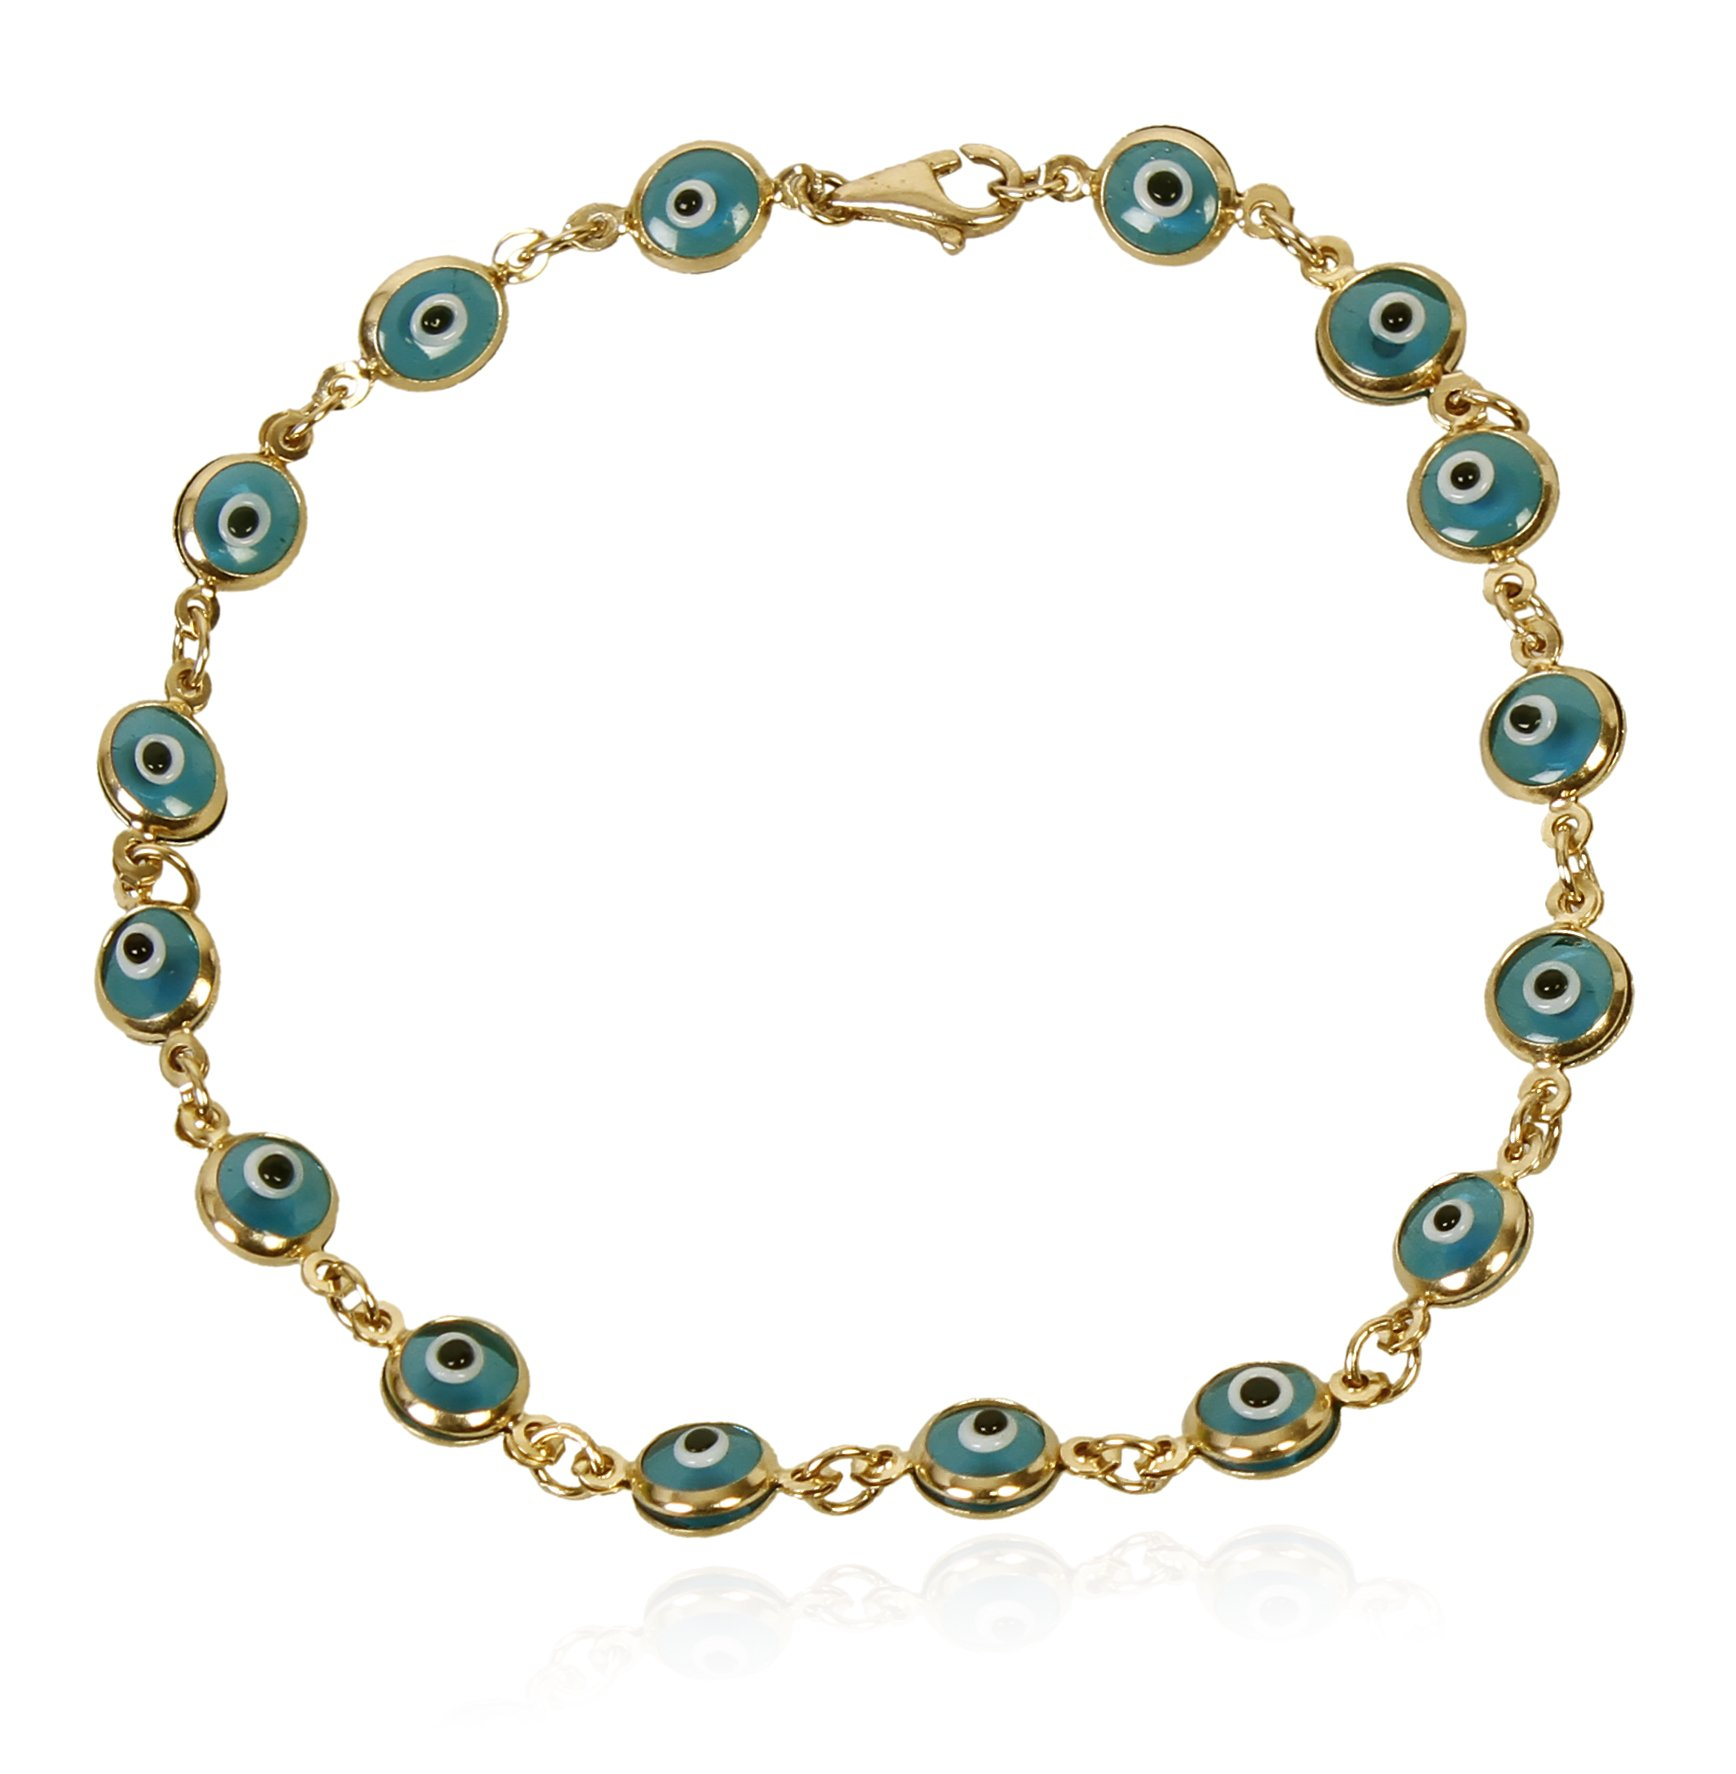 14k Gold 7 Inch Evil Eye Link Chain Bracelet (Blue)